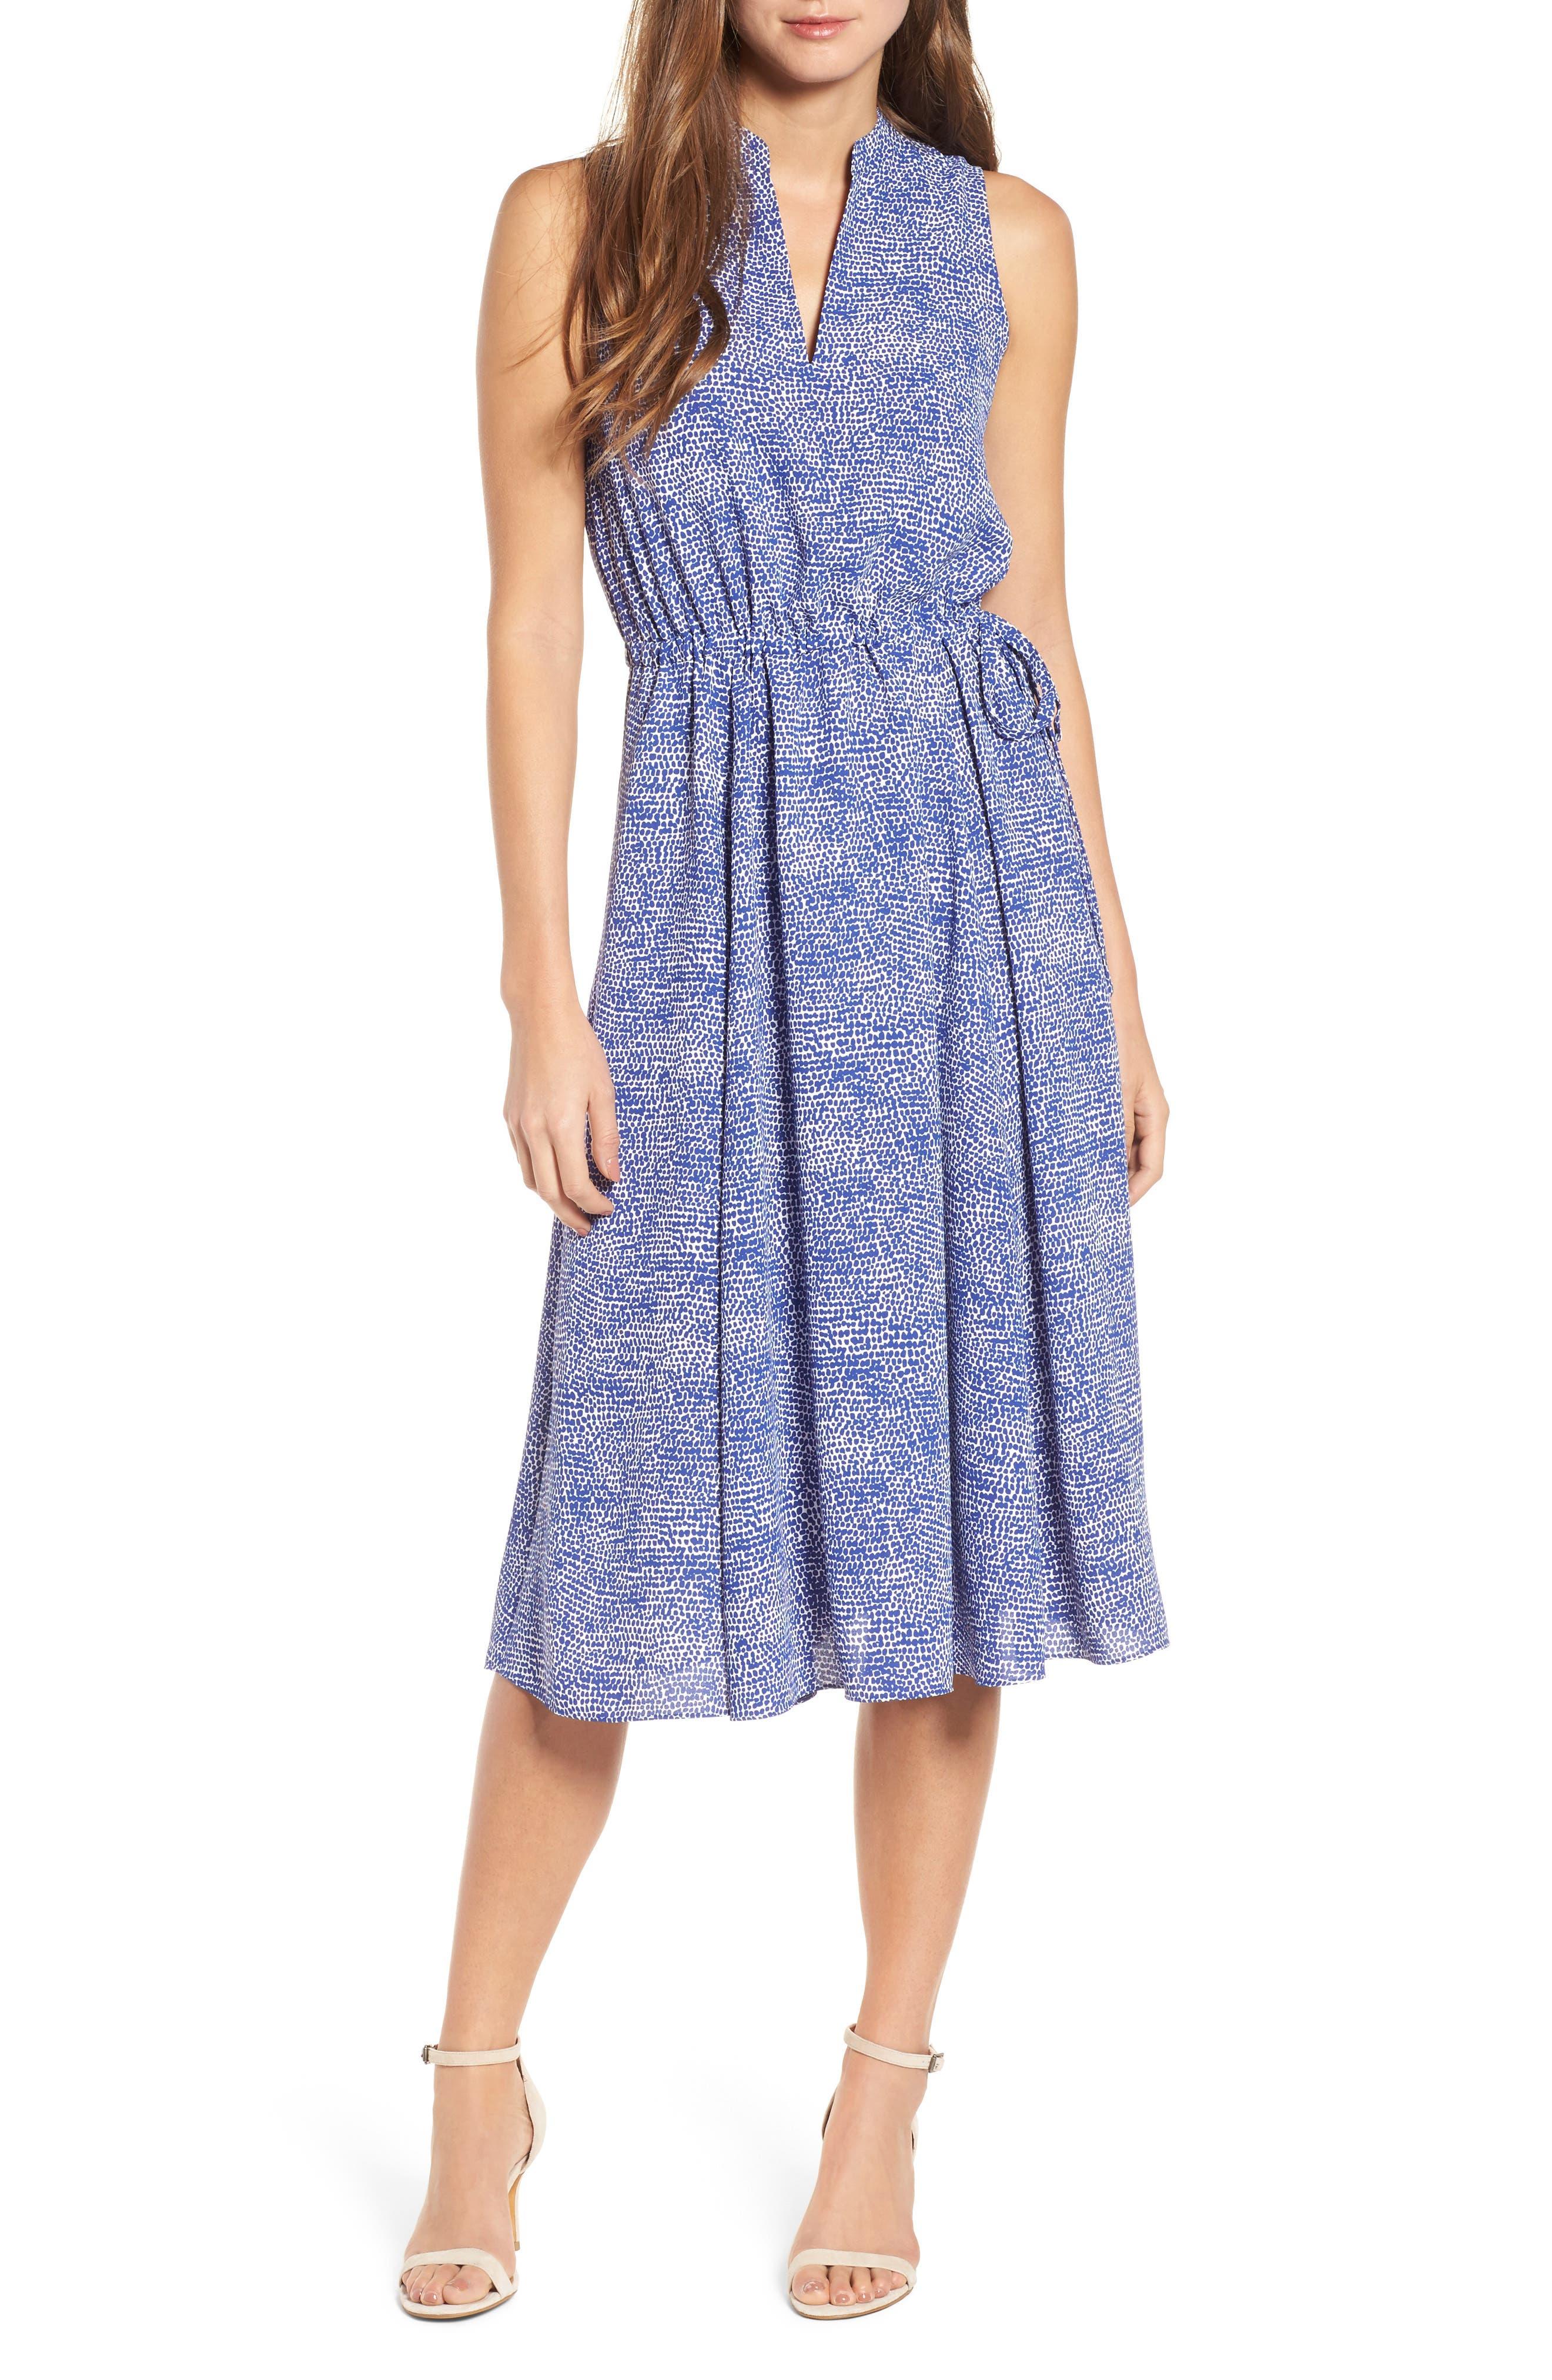 Print Drawstring Midi Dress,                             Main thumbnail 1, color,                             O Keefe Blue/ White Combo